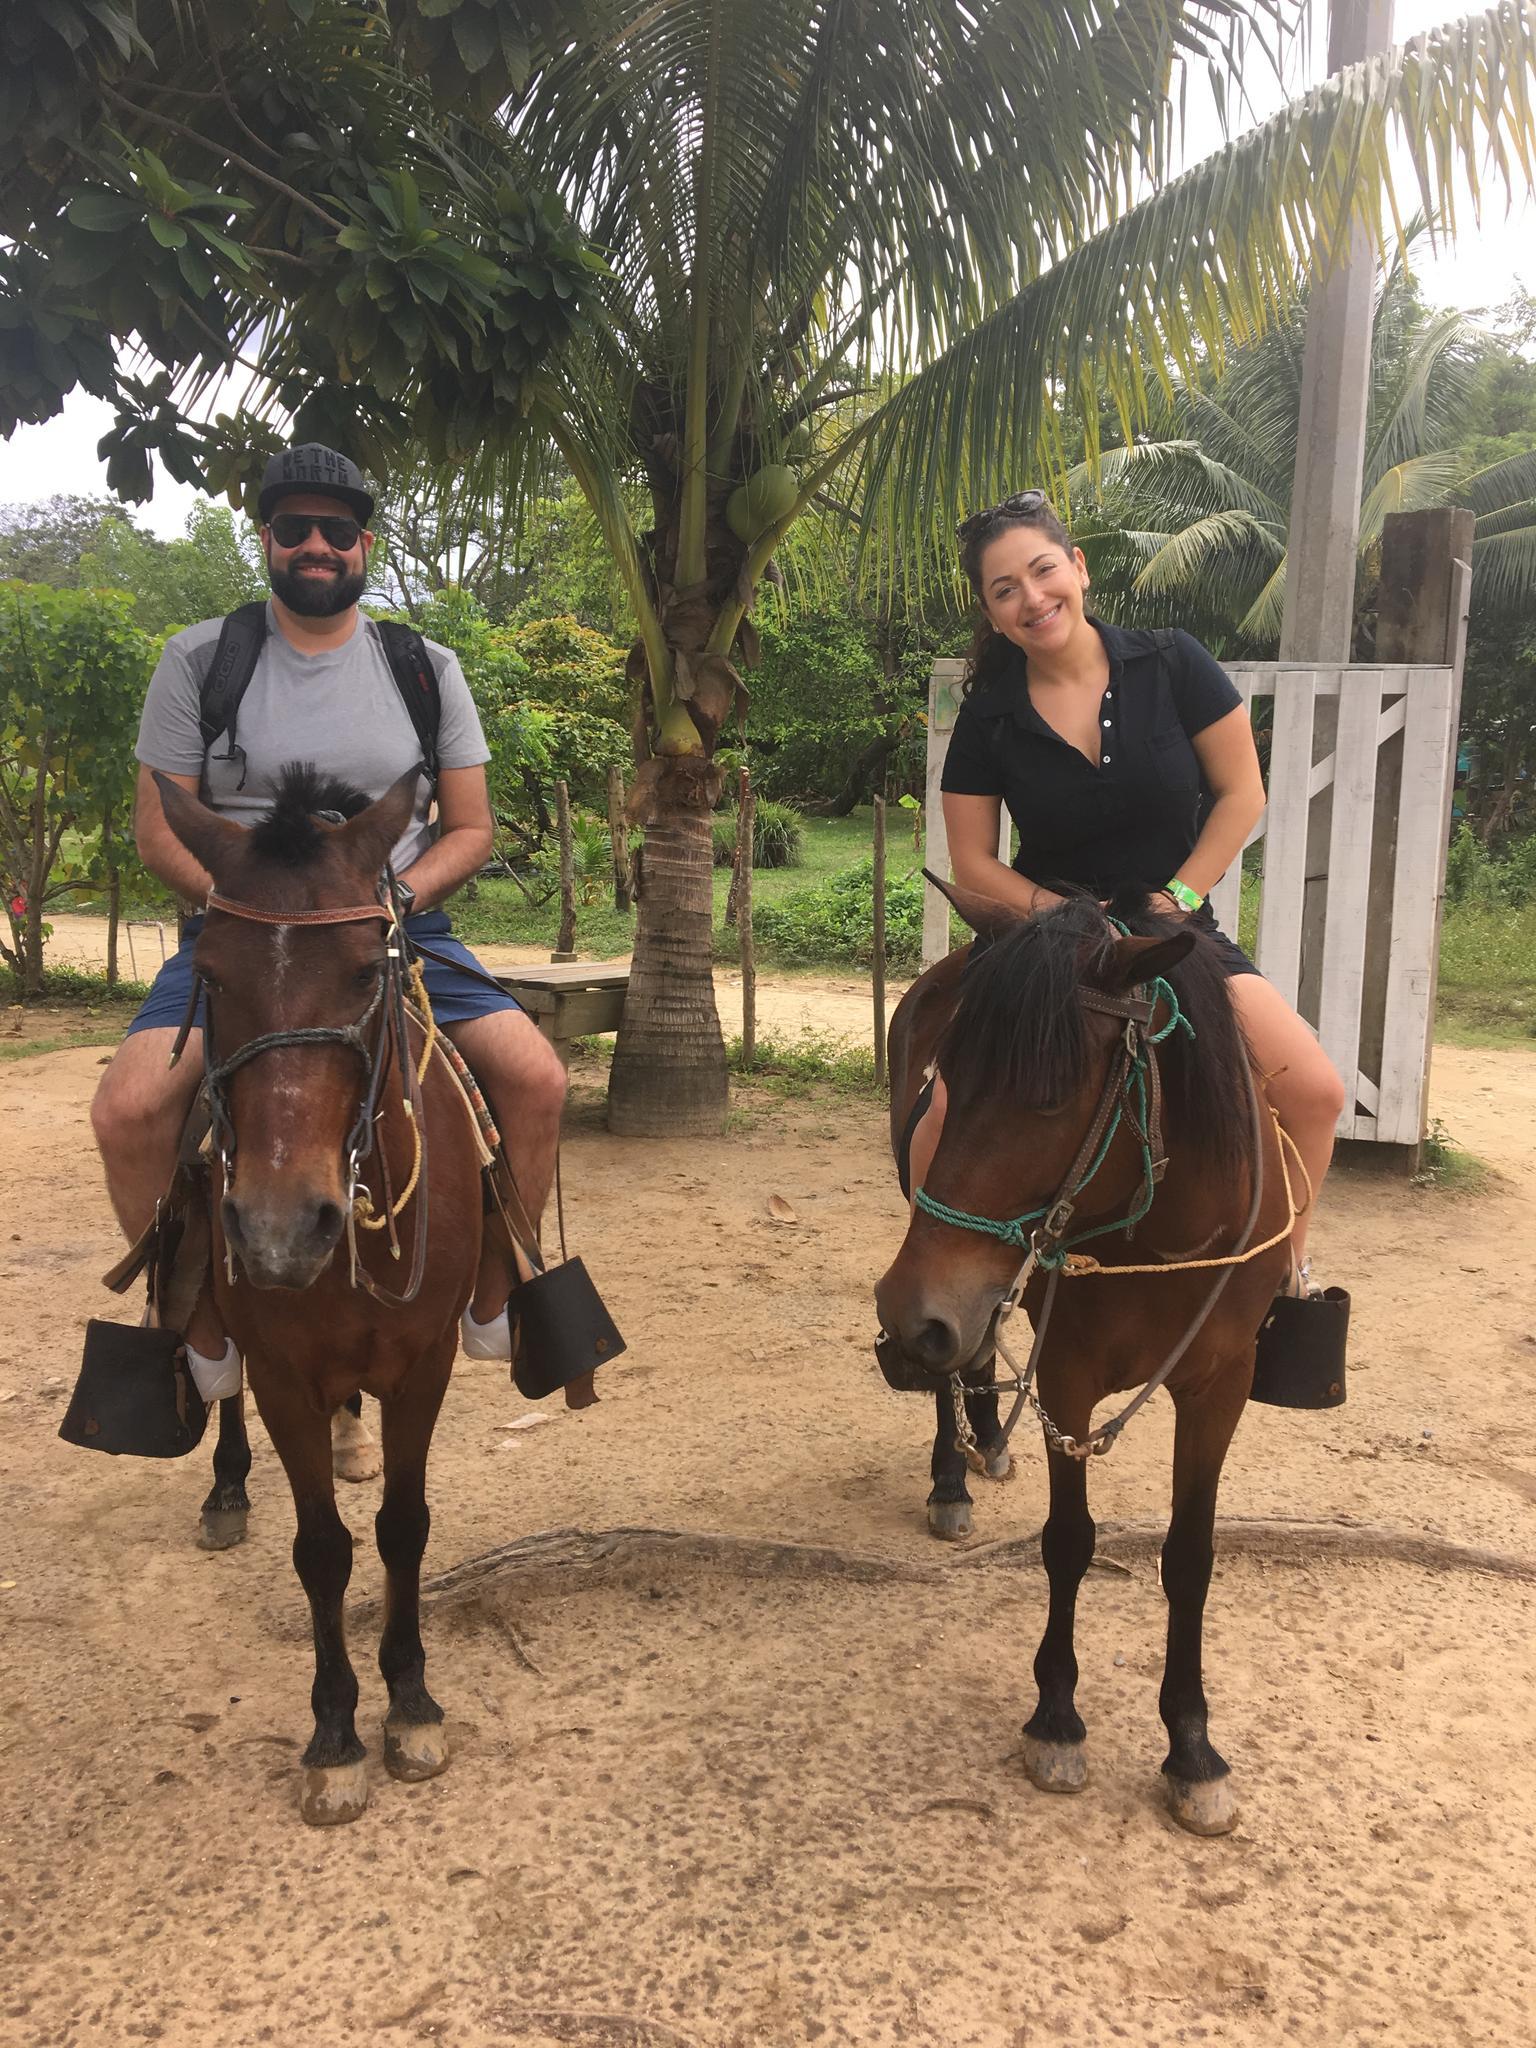 Horseback riding in Roatun